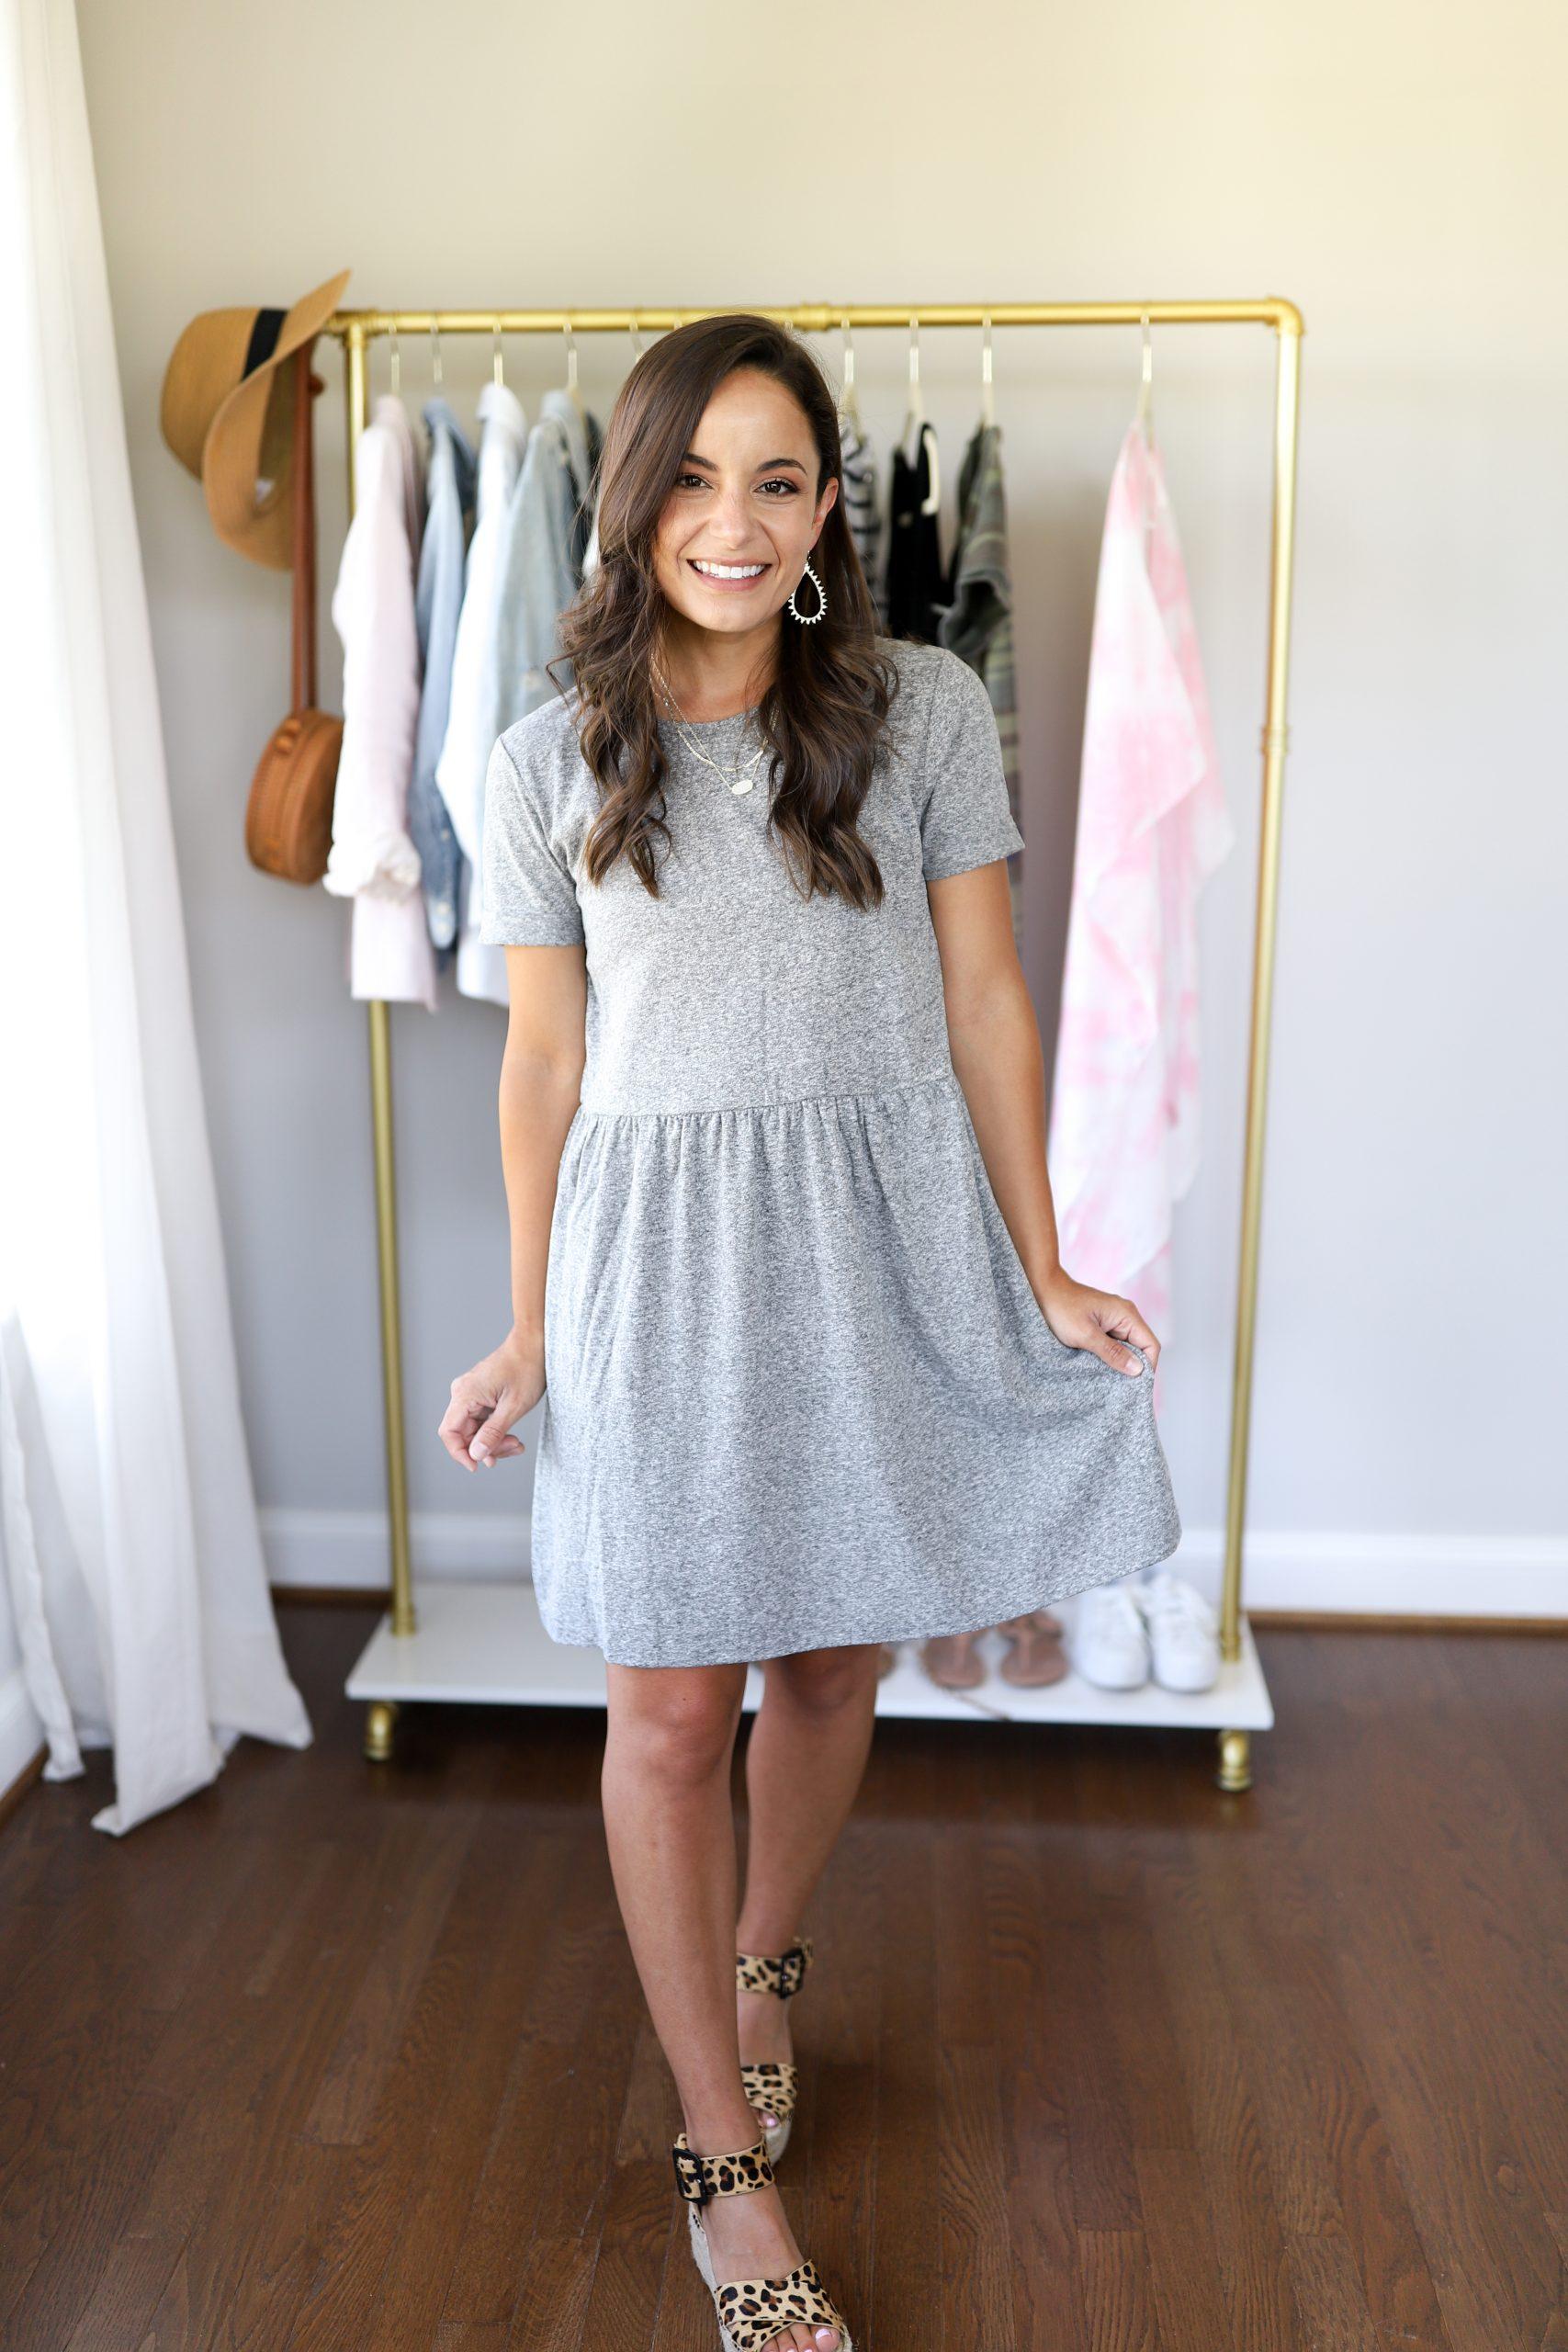 Petite Friendly T-Shirt Dresses | Pumps & Push Ups